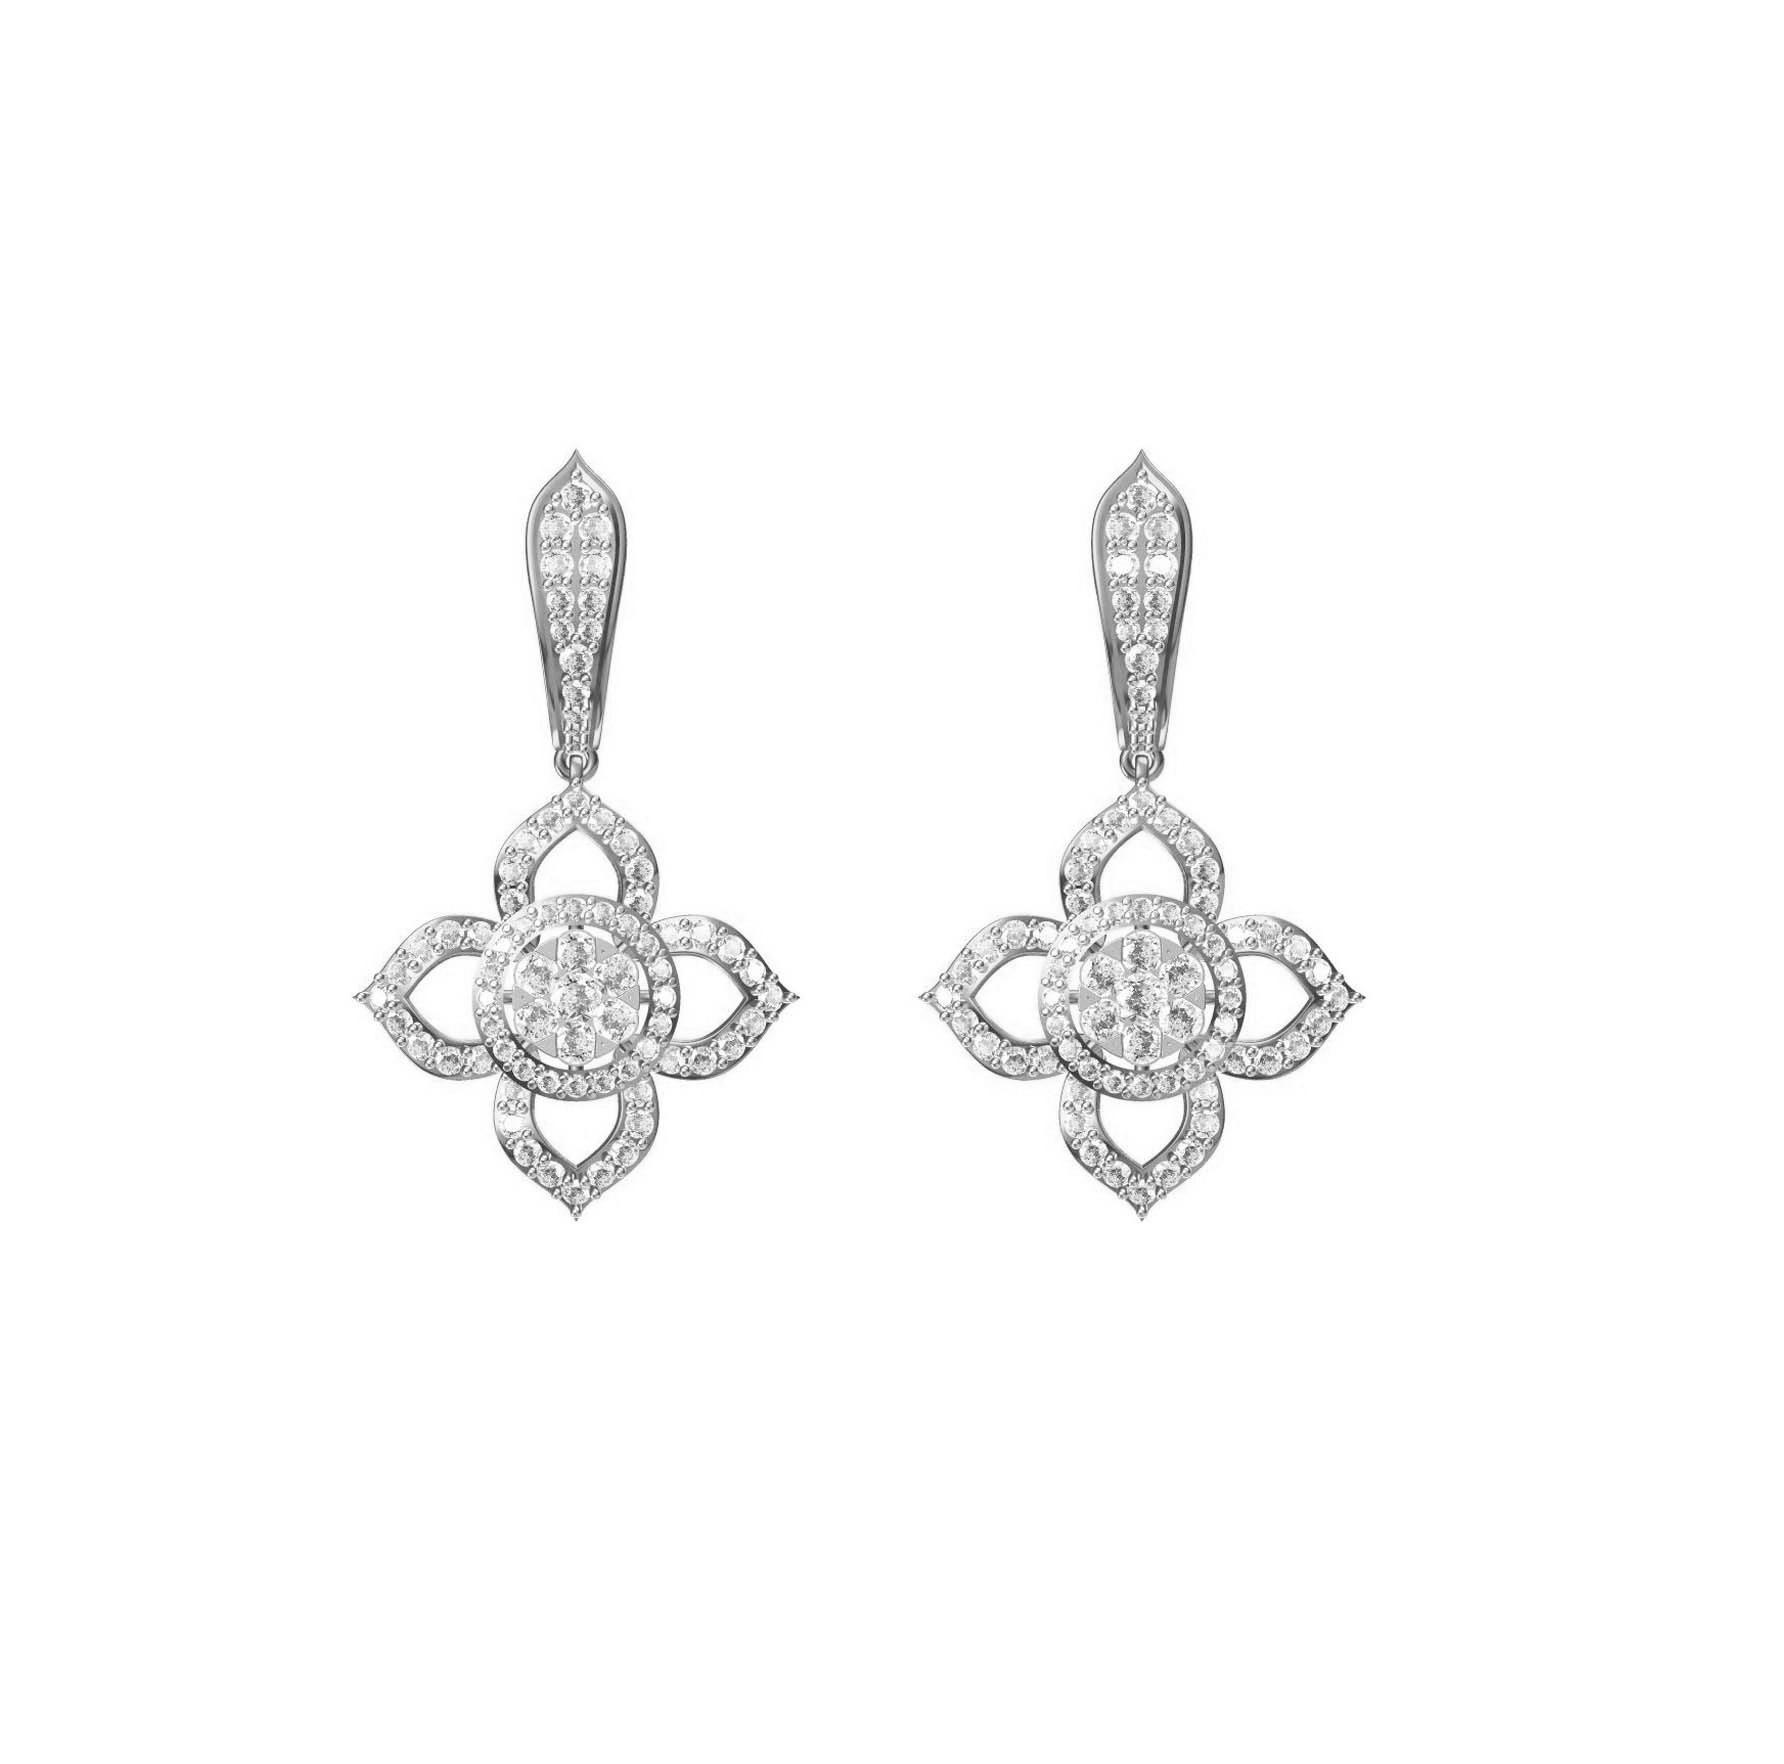 Diamond Earring TCW 2.730ct 14K gold 12 gm